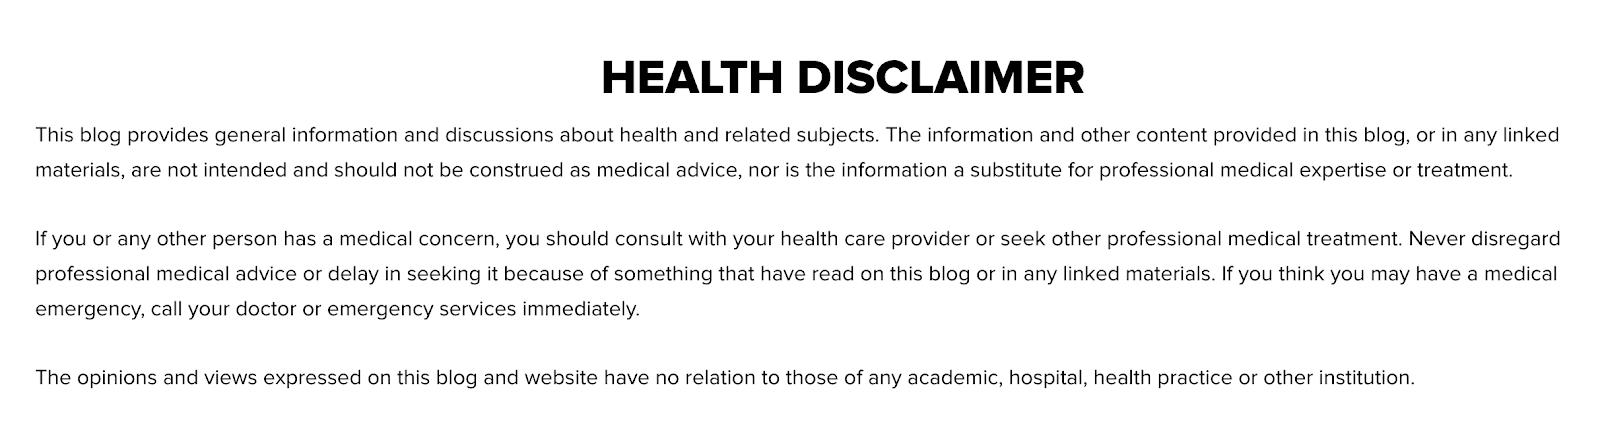 Health disclaimer on Tony Robbins' website